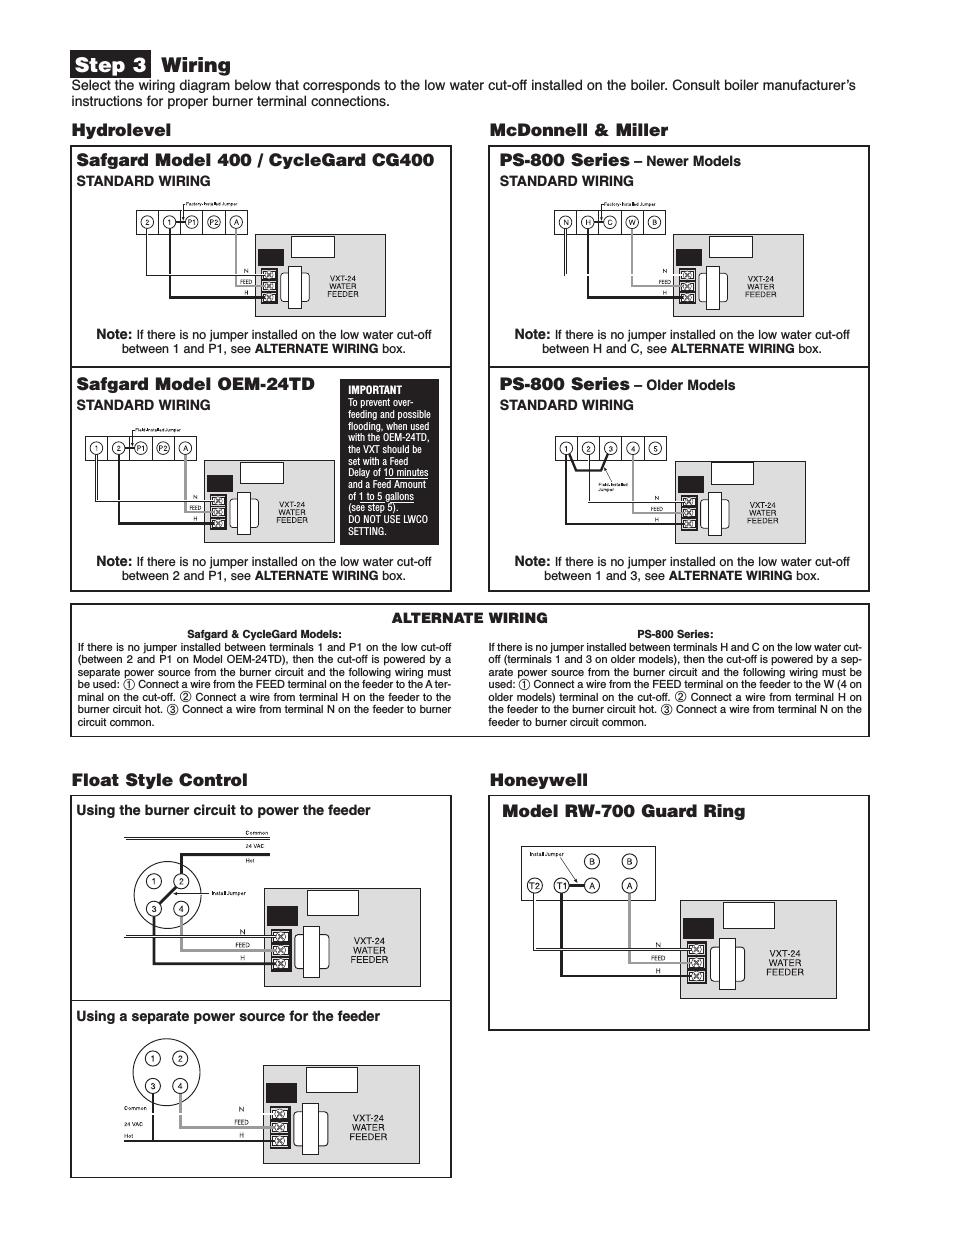 Mcdonnell Miller Low Water Cutoff Wiring Diagram